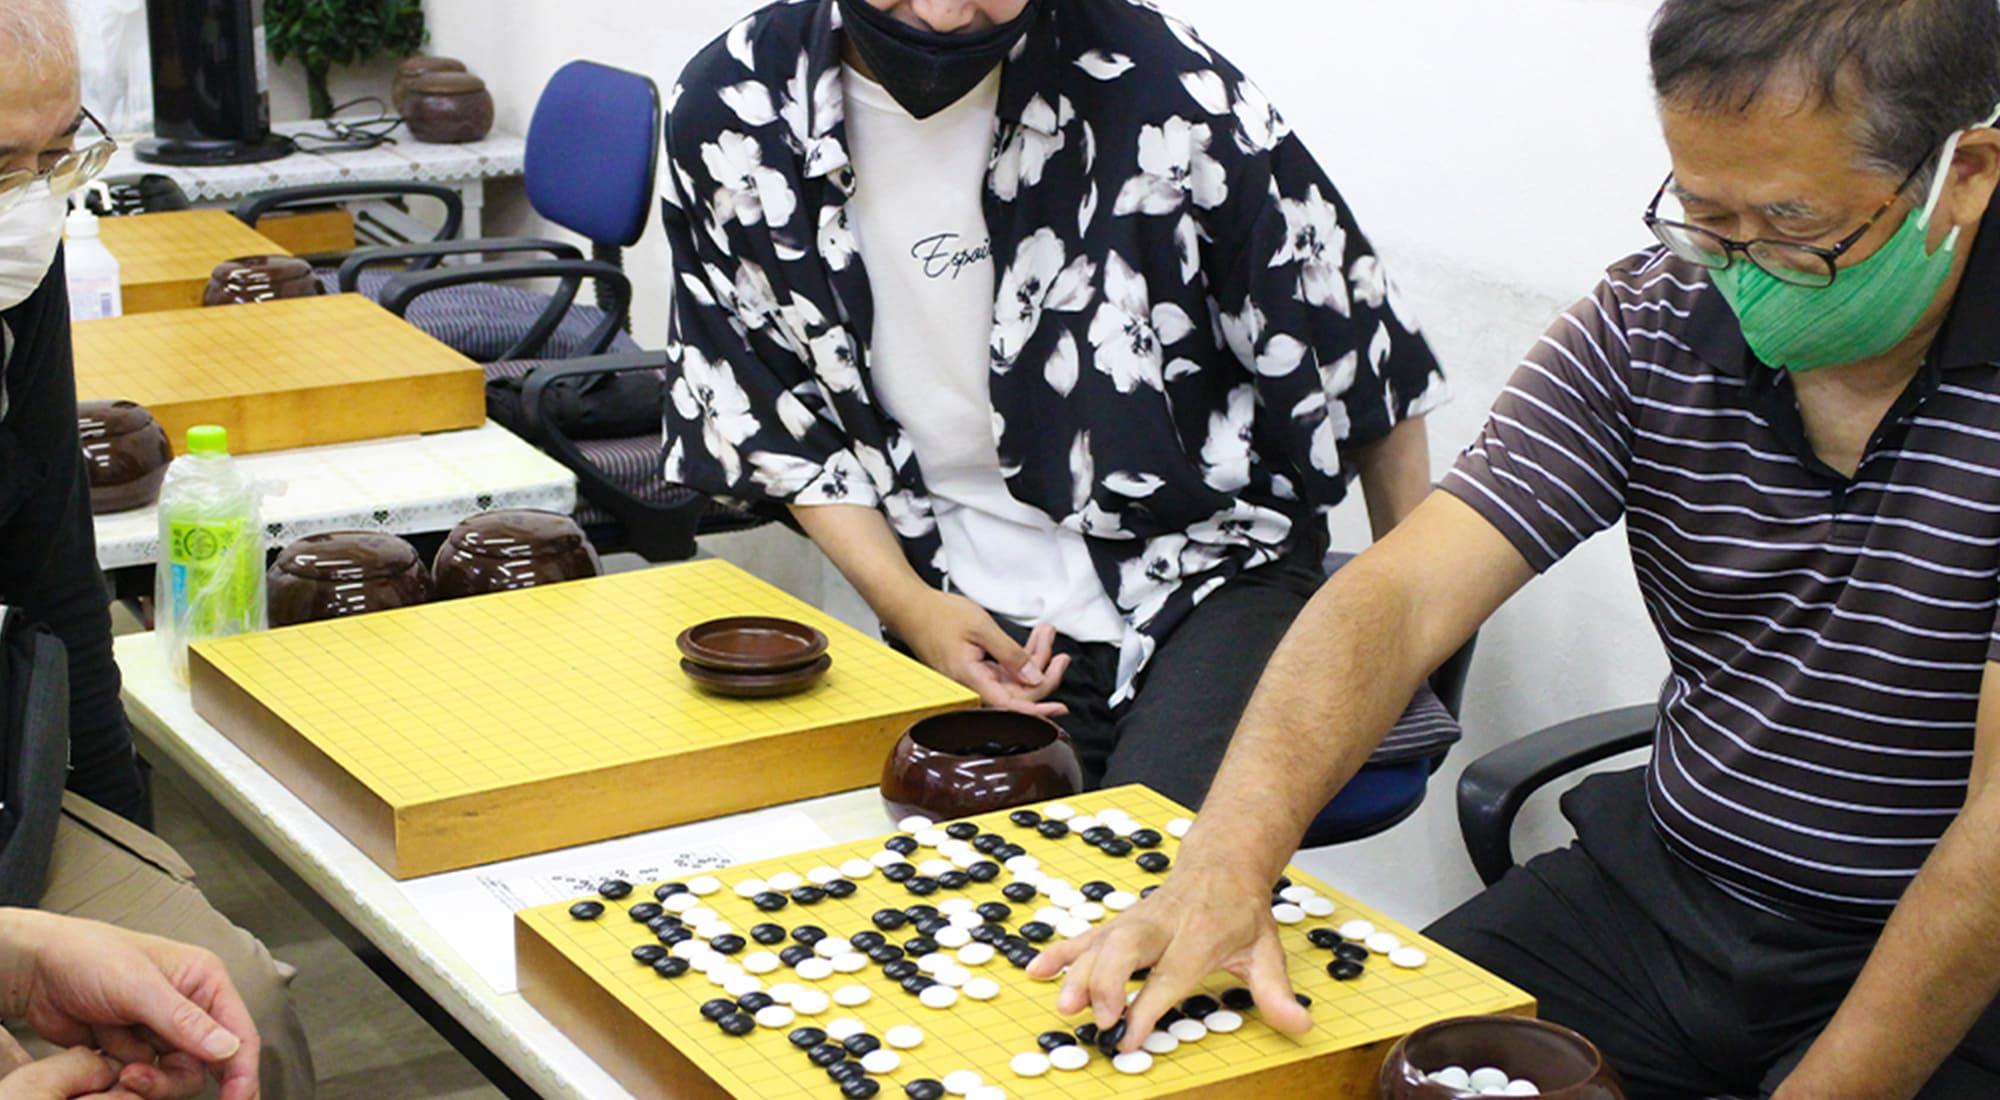 囲碁研究会 薬円台囲碁クラブ